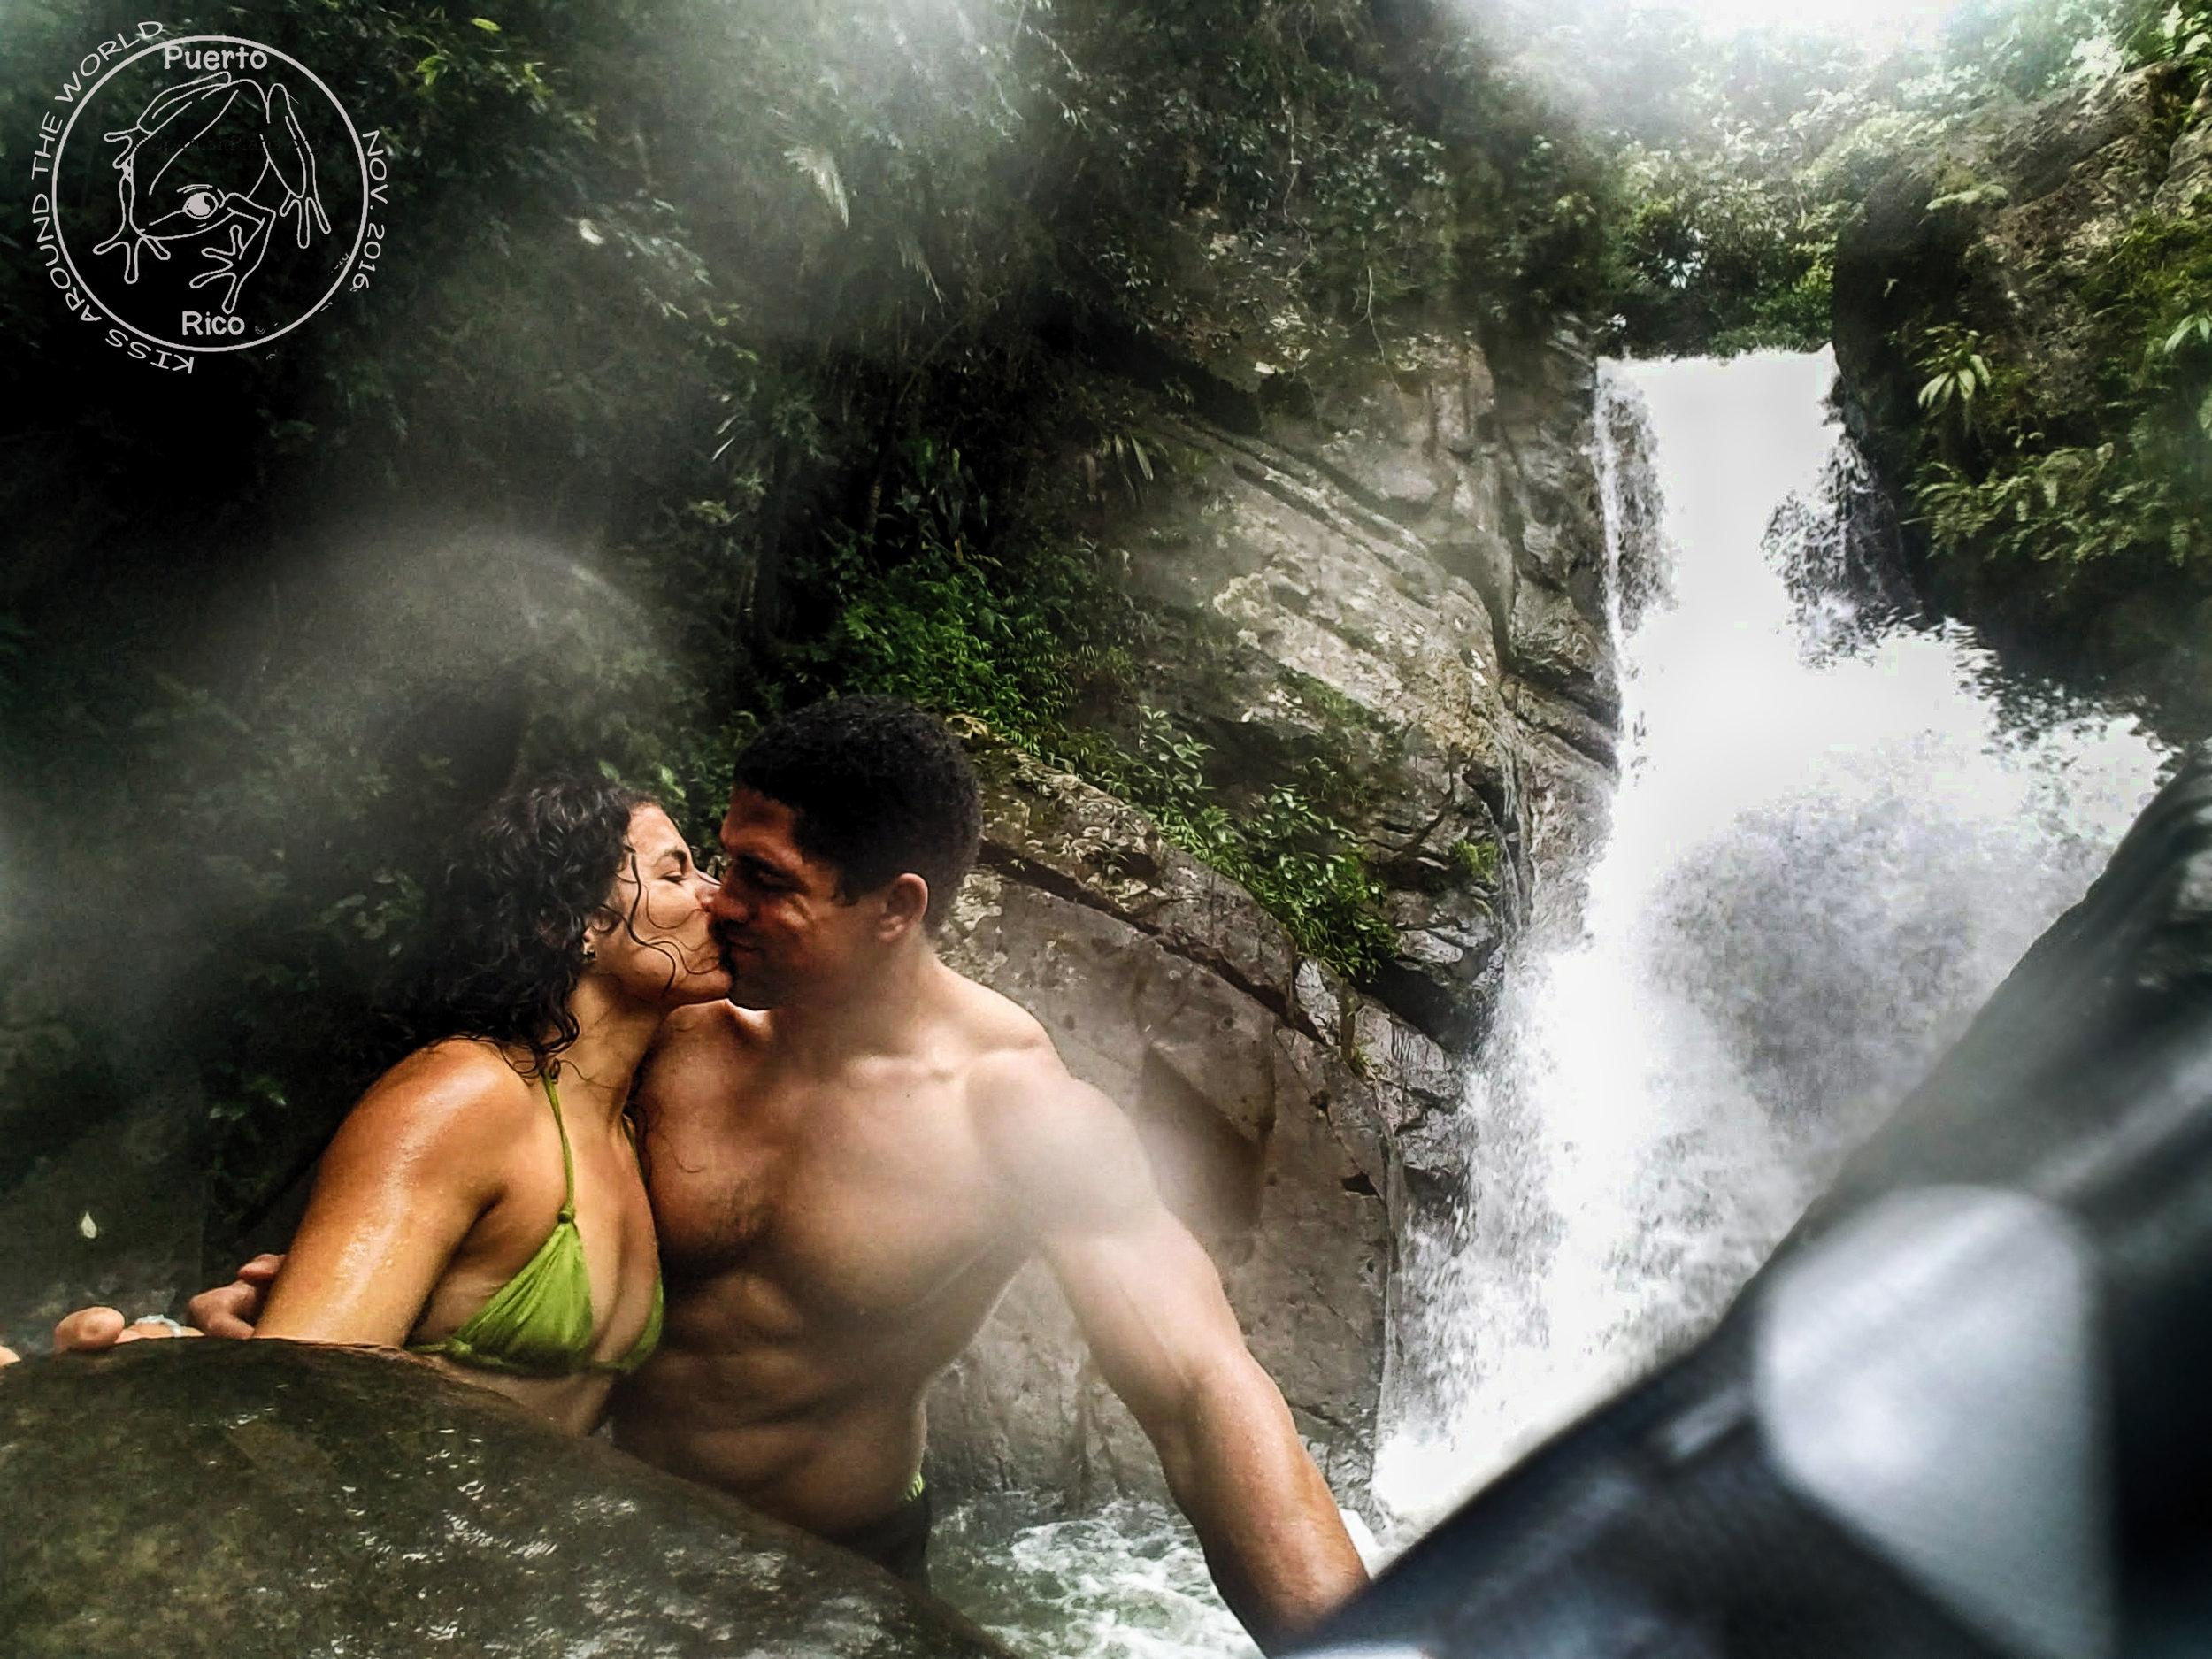 vickygood_photography_puertorico_travel_kiss.JPG